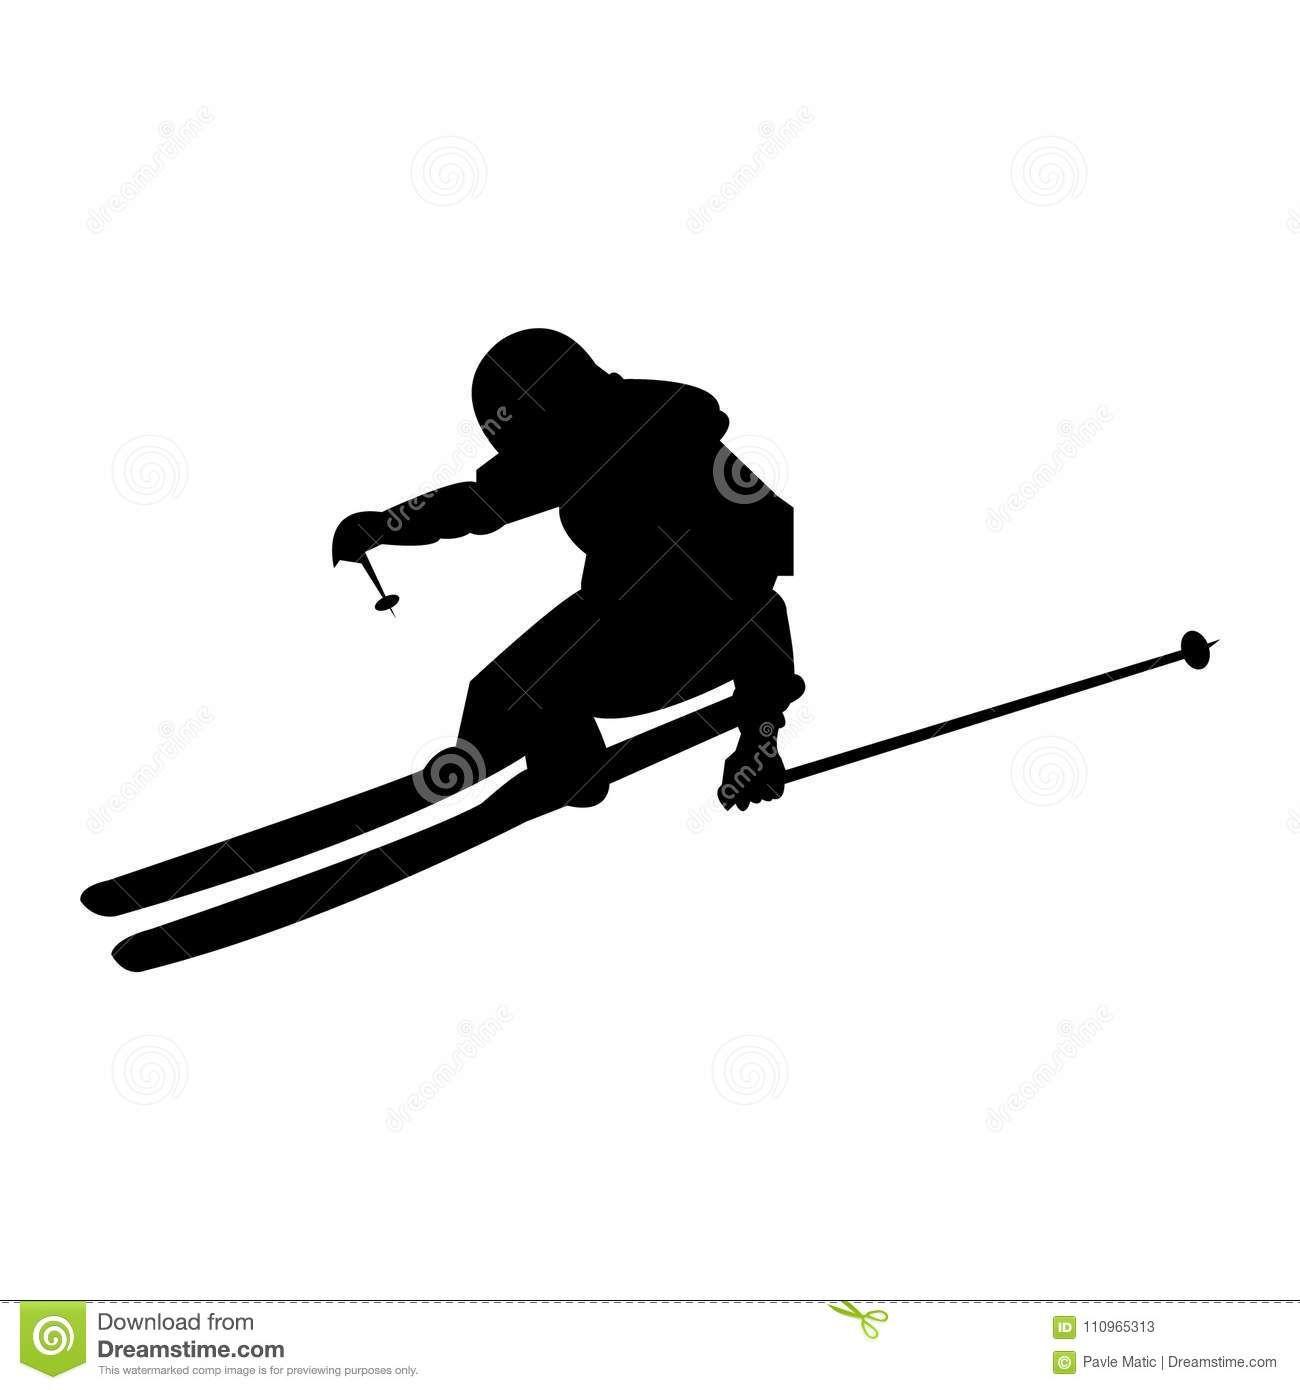 Simple Skier Skiing Down The Slopes Stock Illustration Illustration Of Season Activity 110965313 Skier Skiing Sophisticated Art